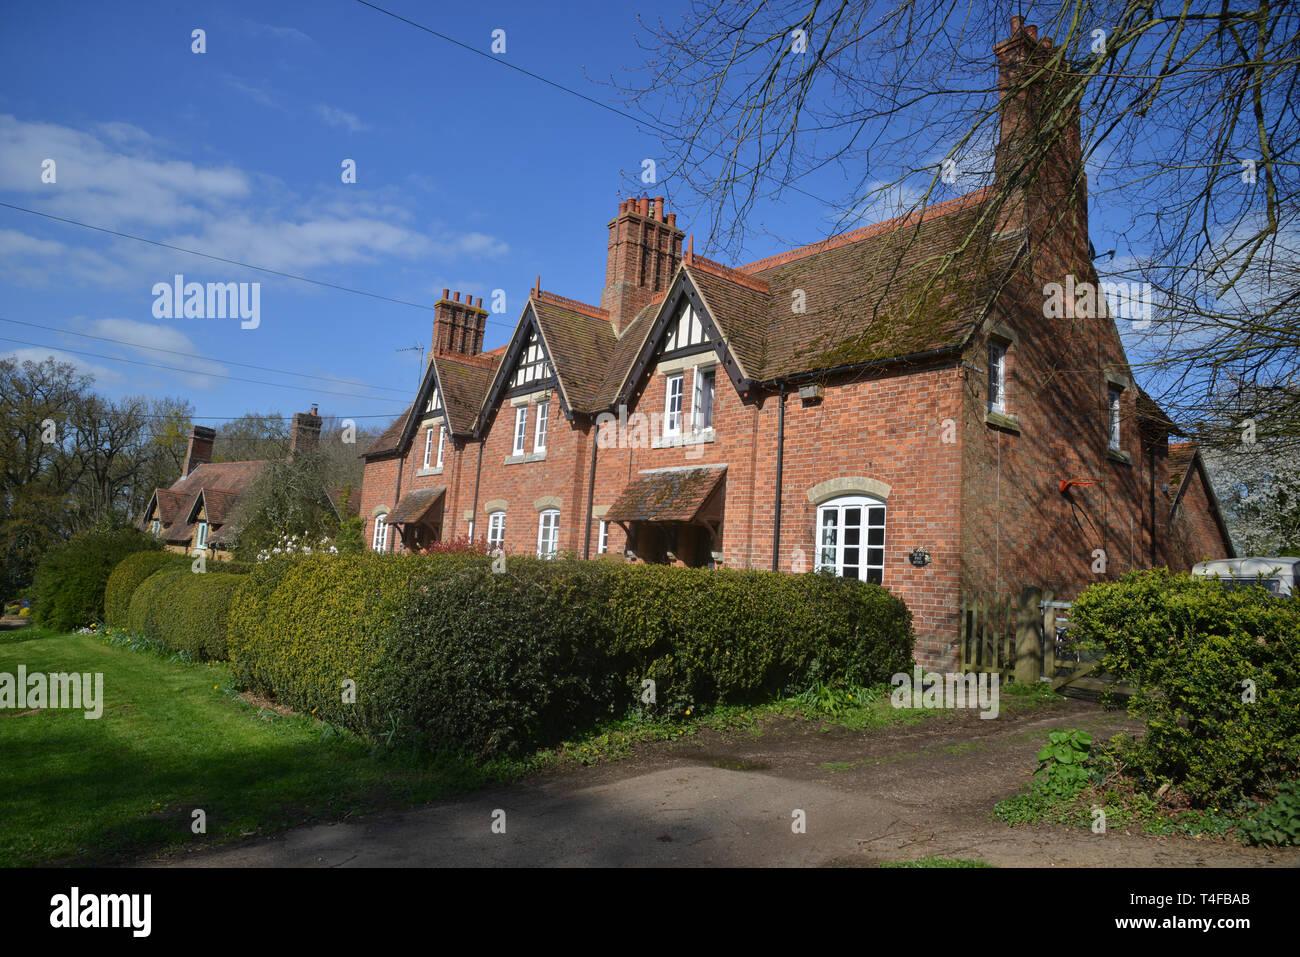 House in the Warwickshire village of Wormleighton captured in spring sunshine Stock Photo